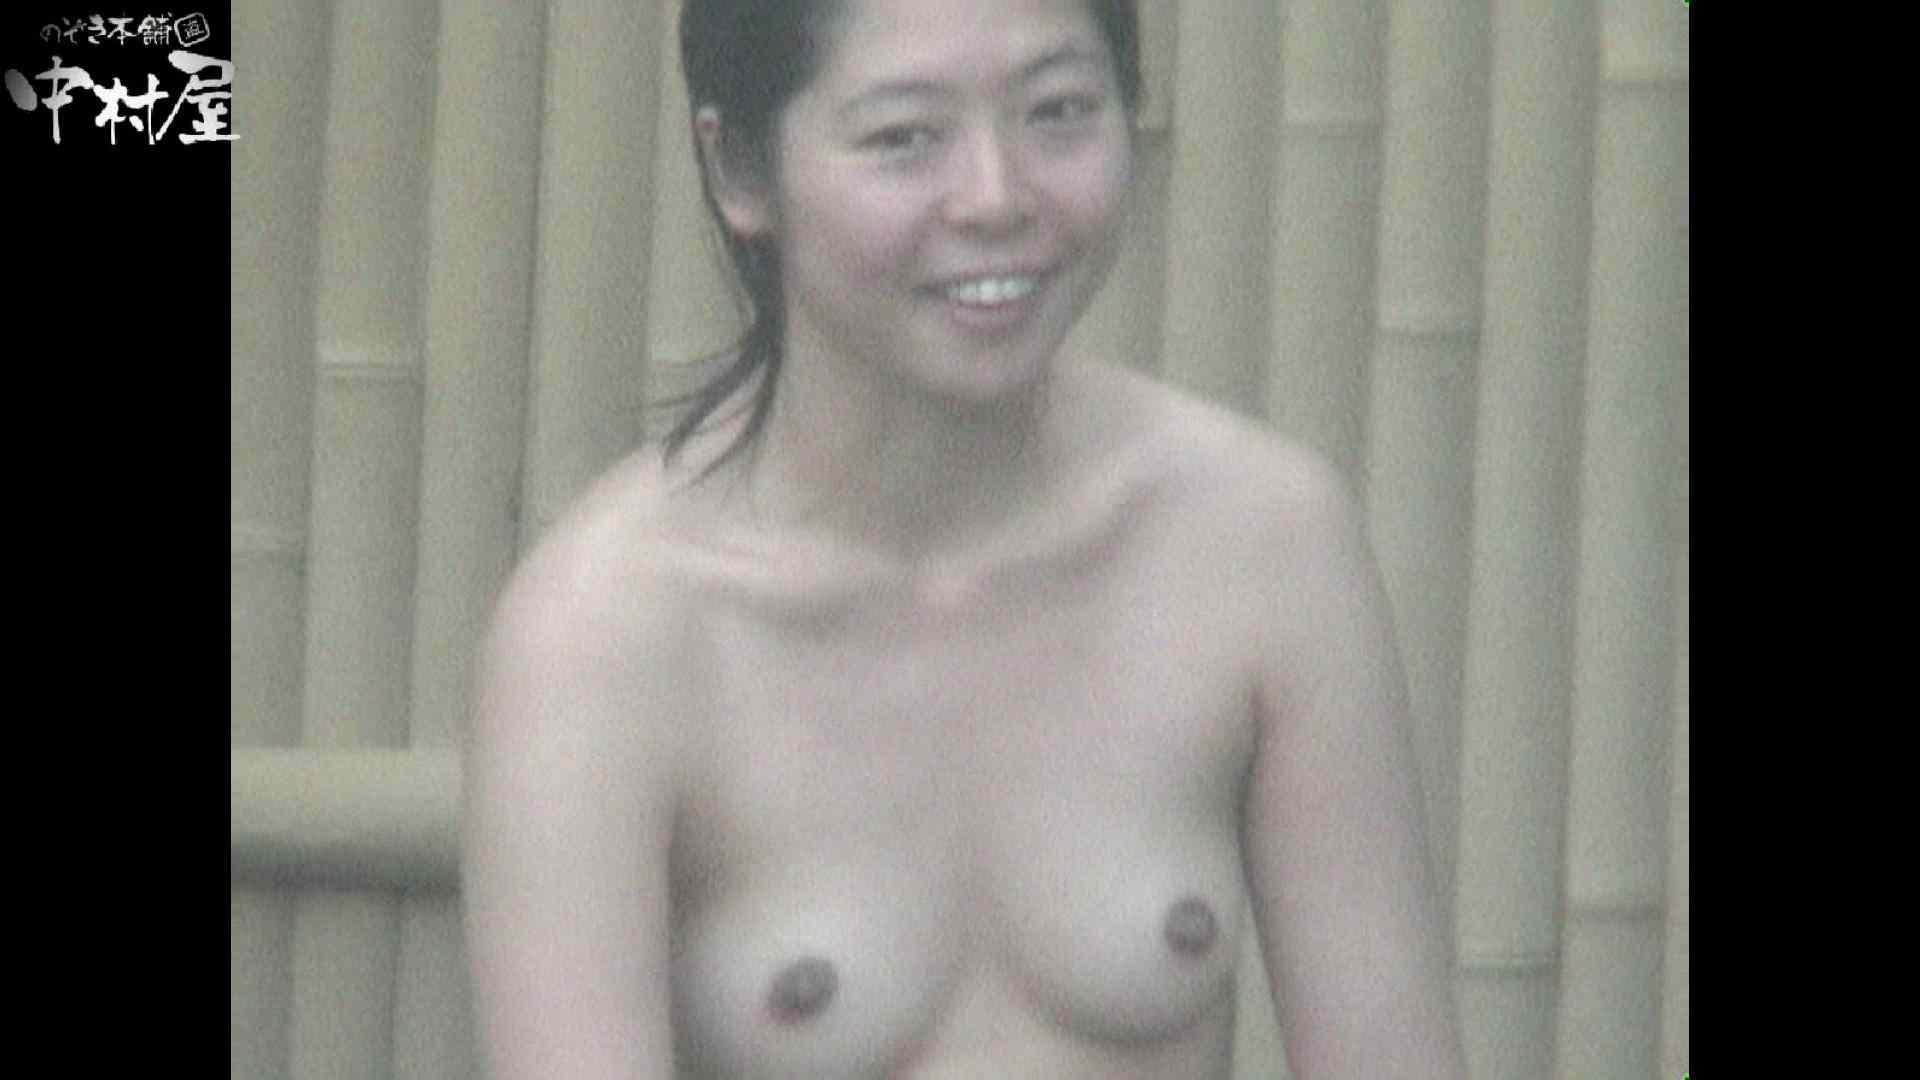 Aquaな露天風呂Vol.932 盗撮師作品 | 露天風呂突入  106pic 10